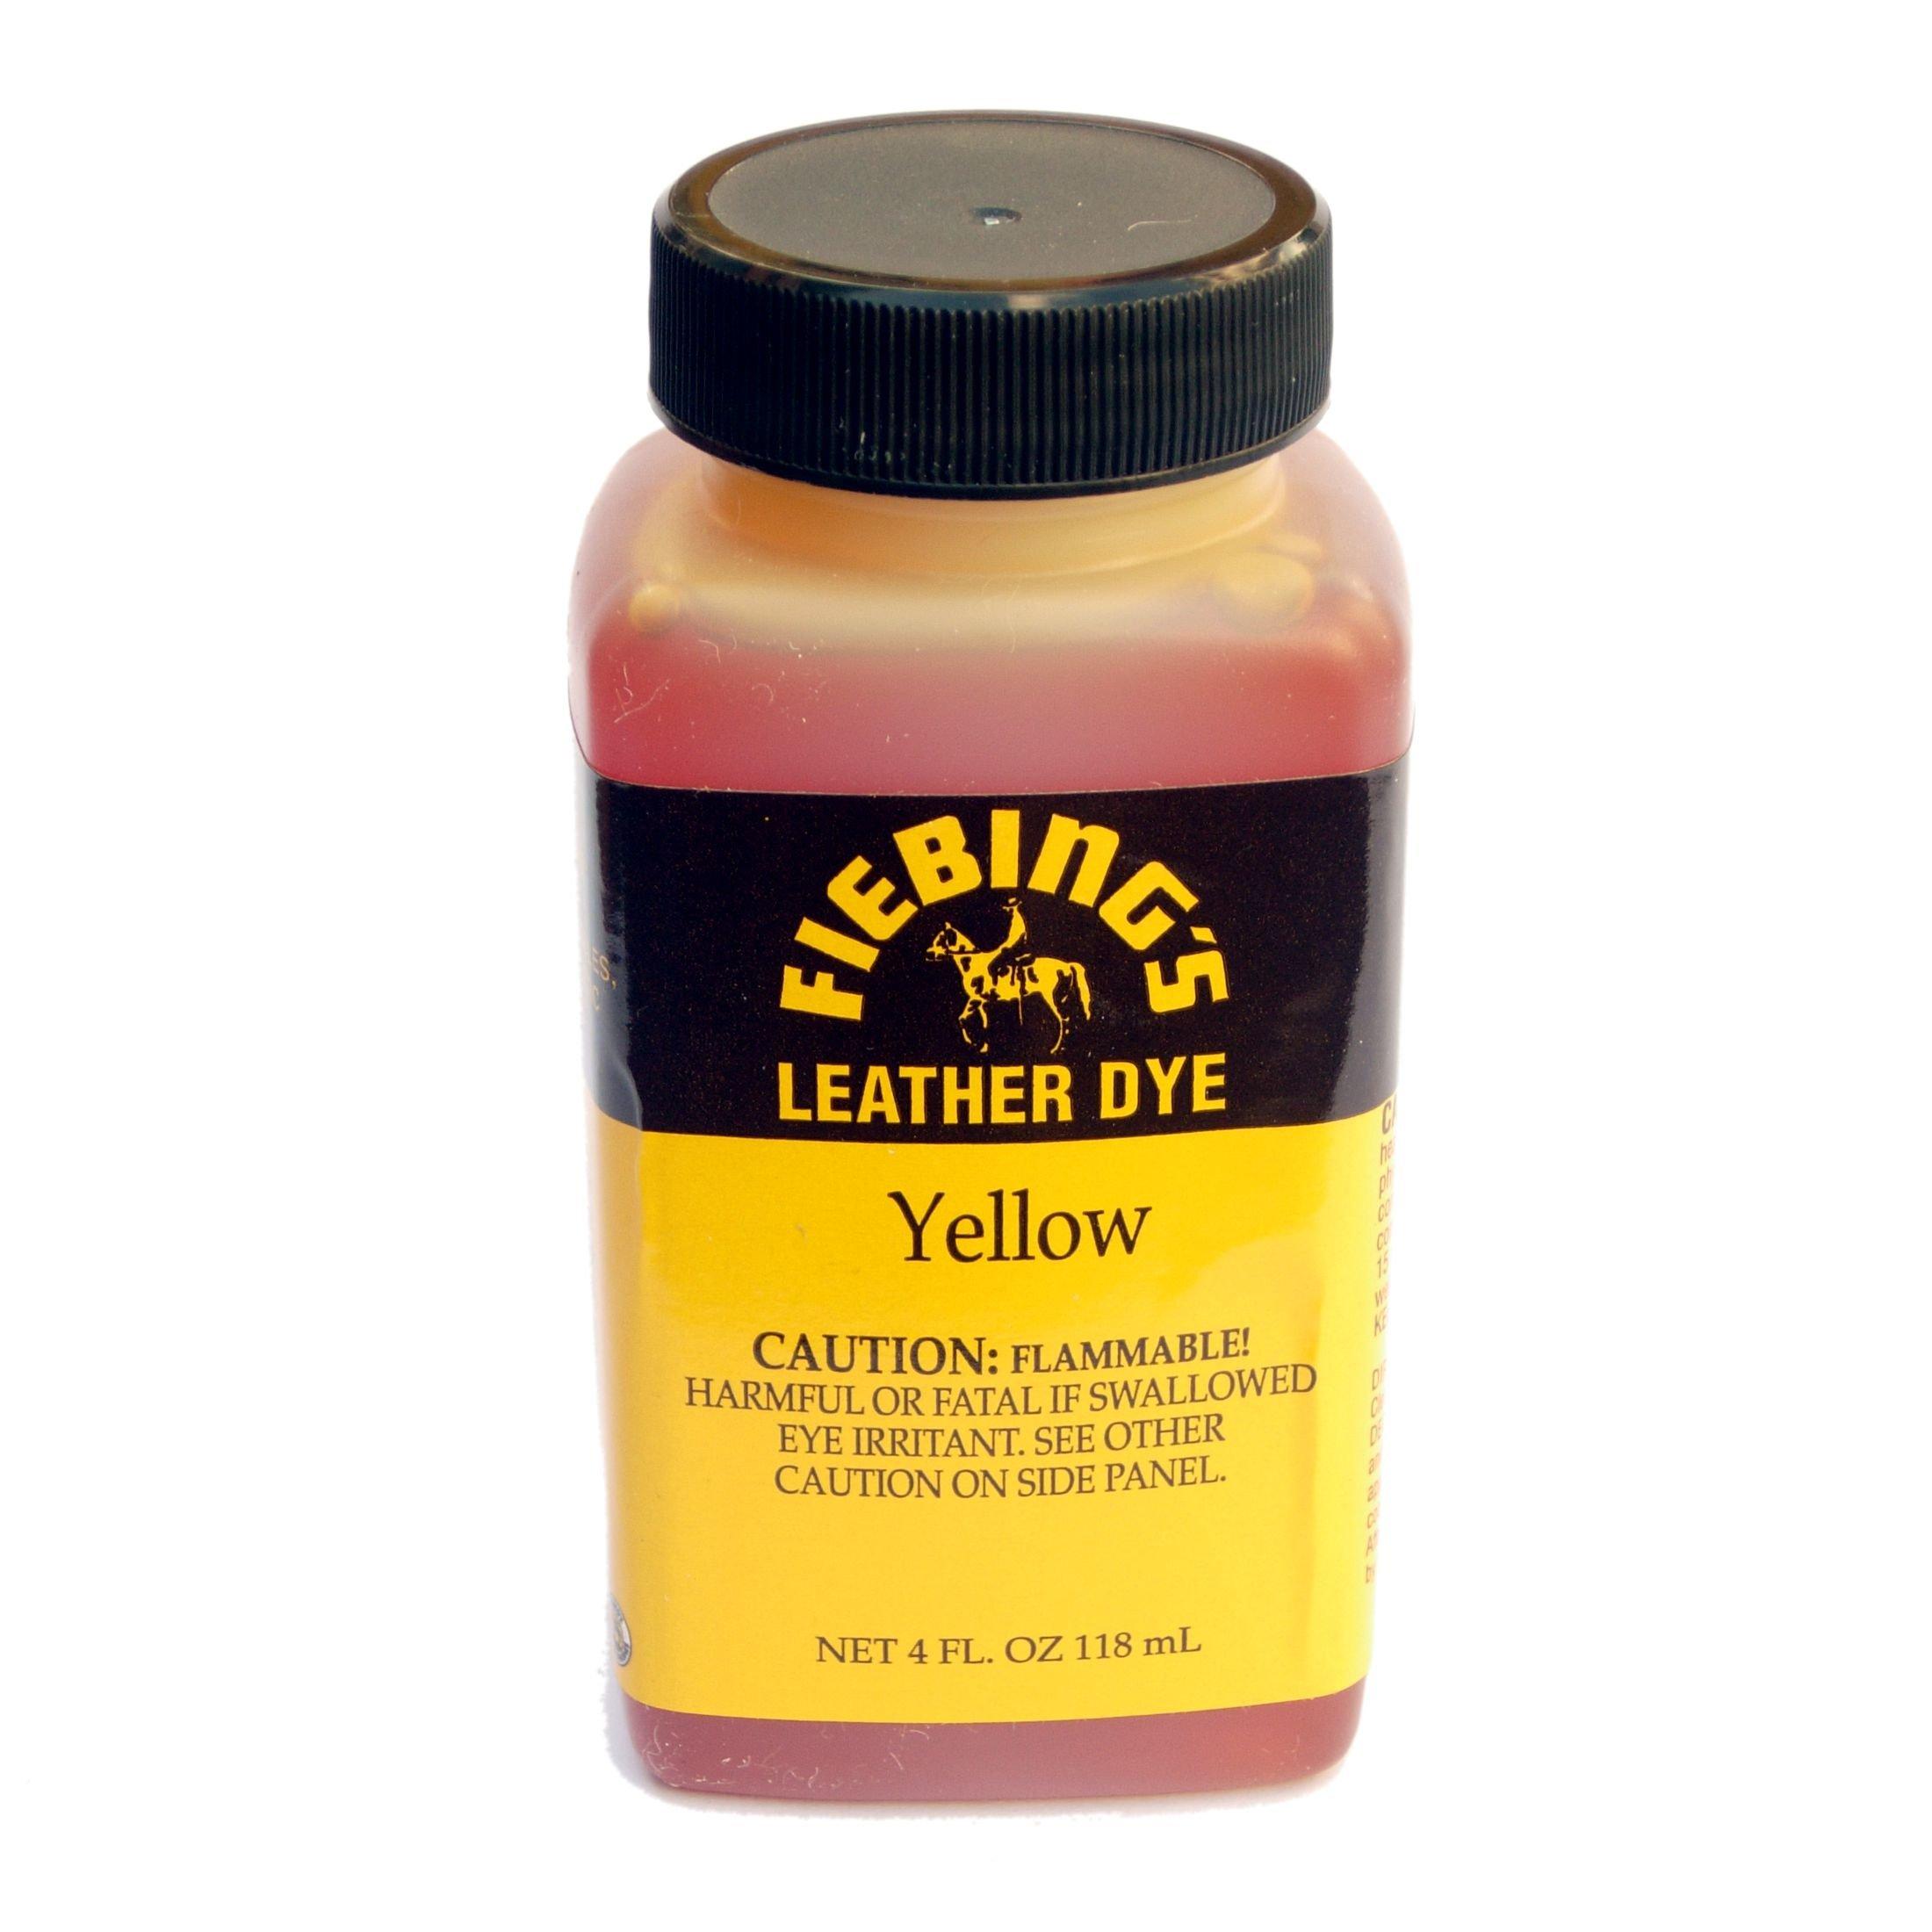 Fiebing's Leather Dye 4 Fl. Oz. (118 Ml) - 27 Colors (Yellow)